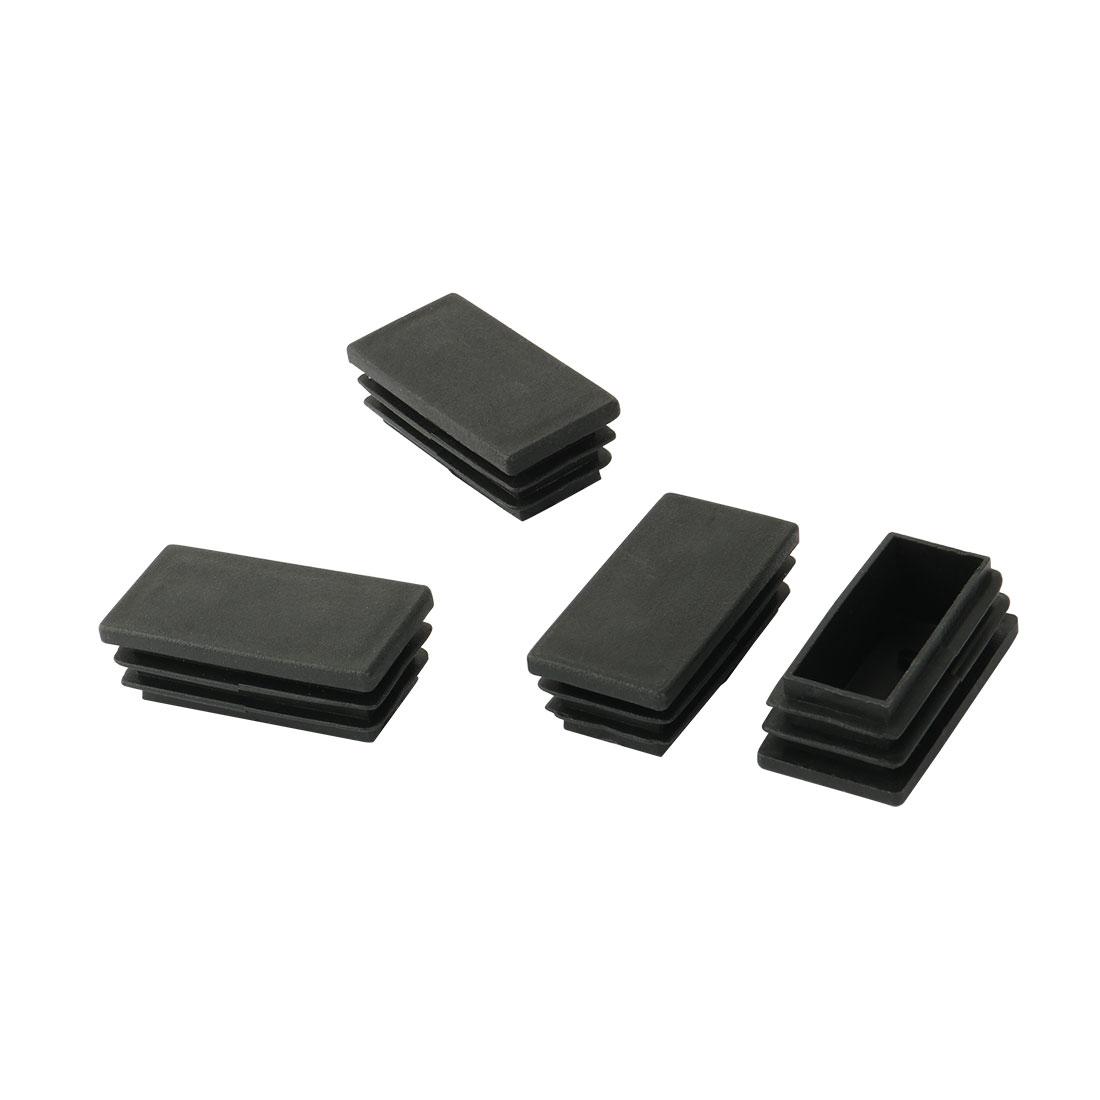 Plastic Rectangle Blanking End Tubing Cap Insert Bung Black 50mm x 25mm 4 Pcs